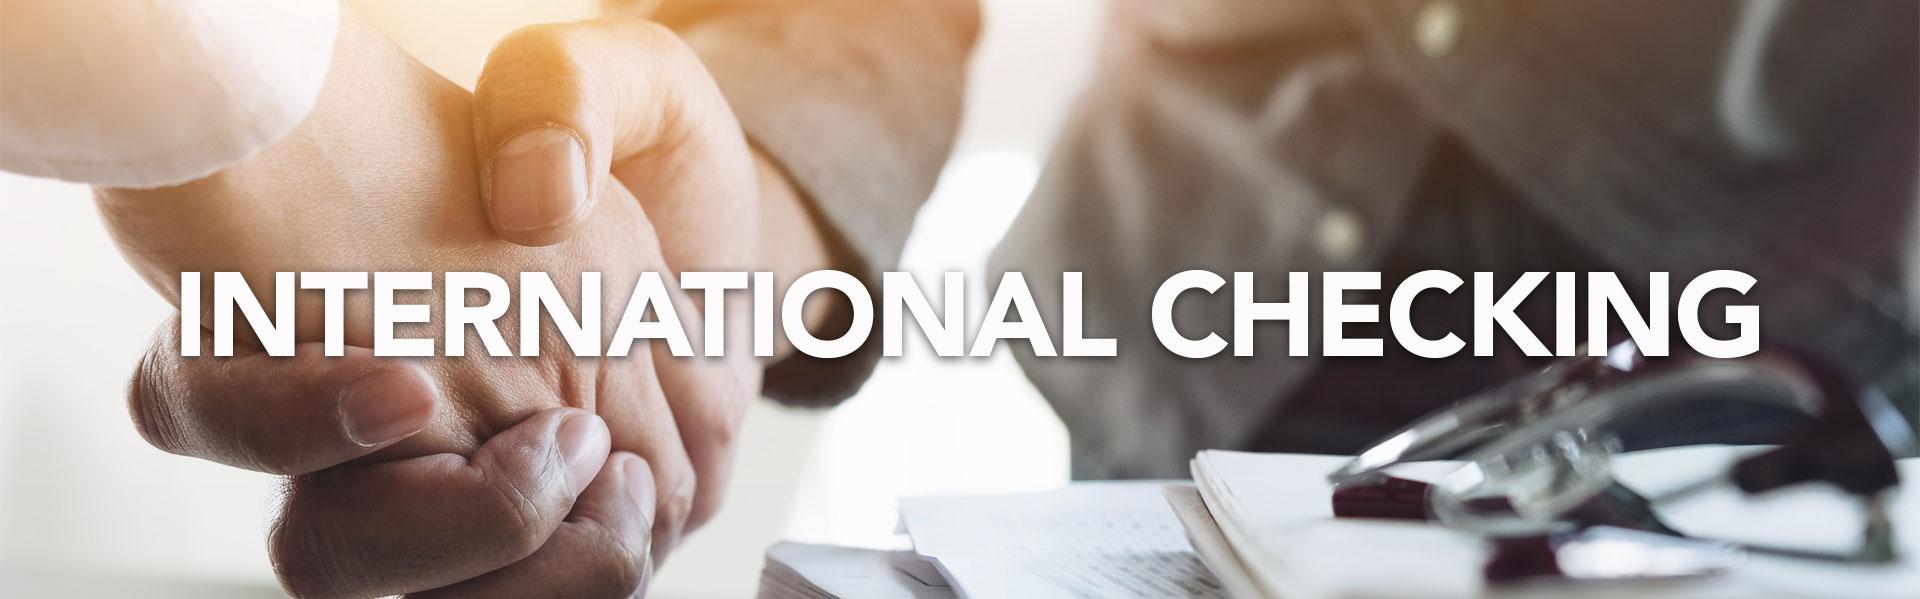 IBC Bank International Checking Guide